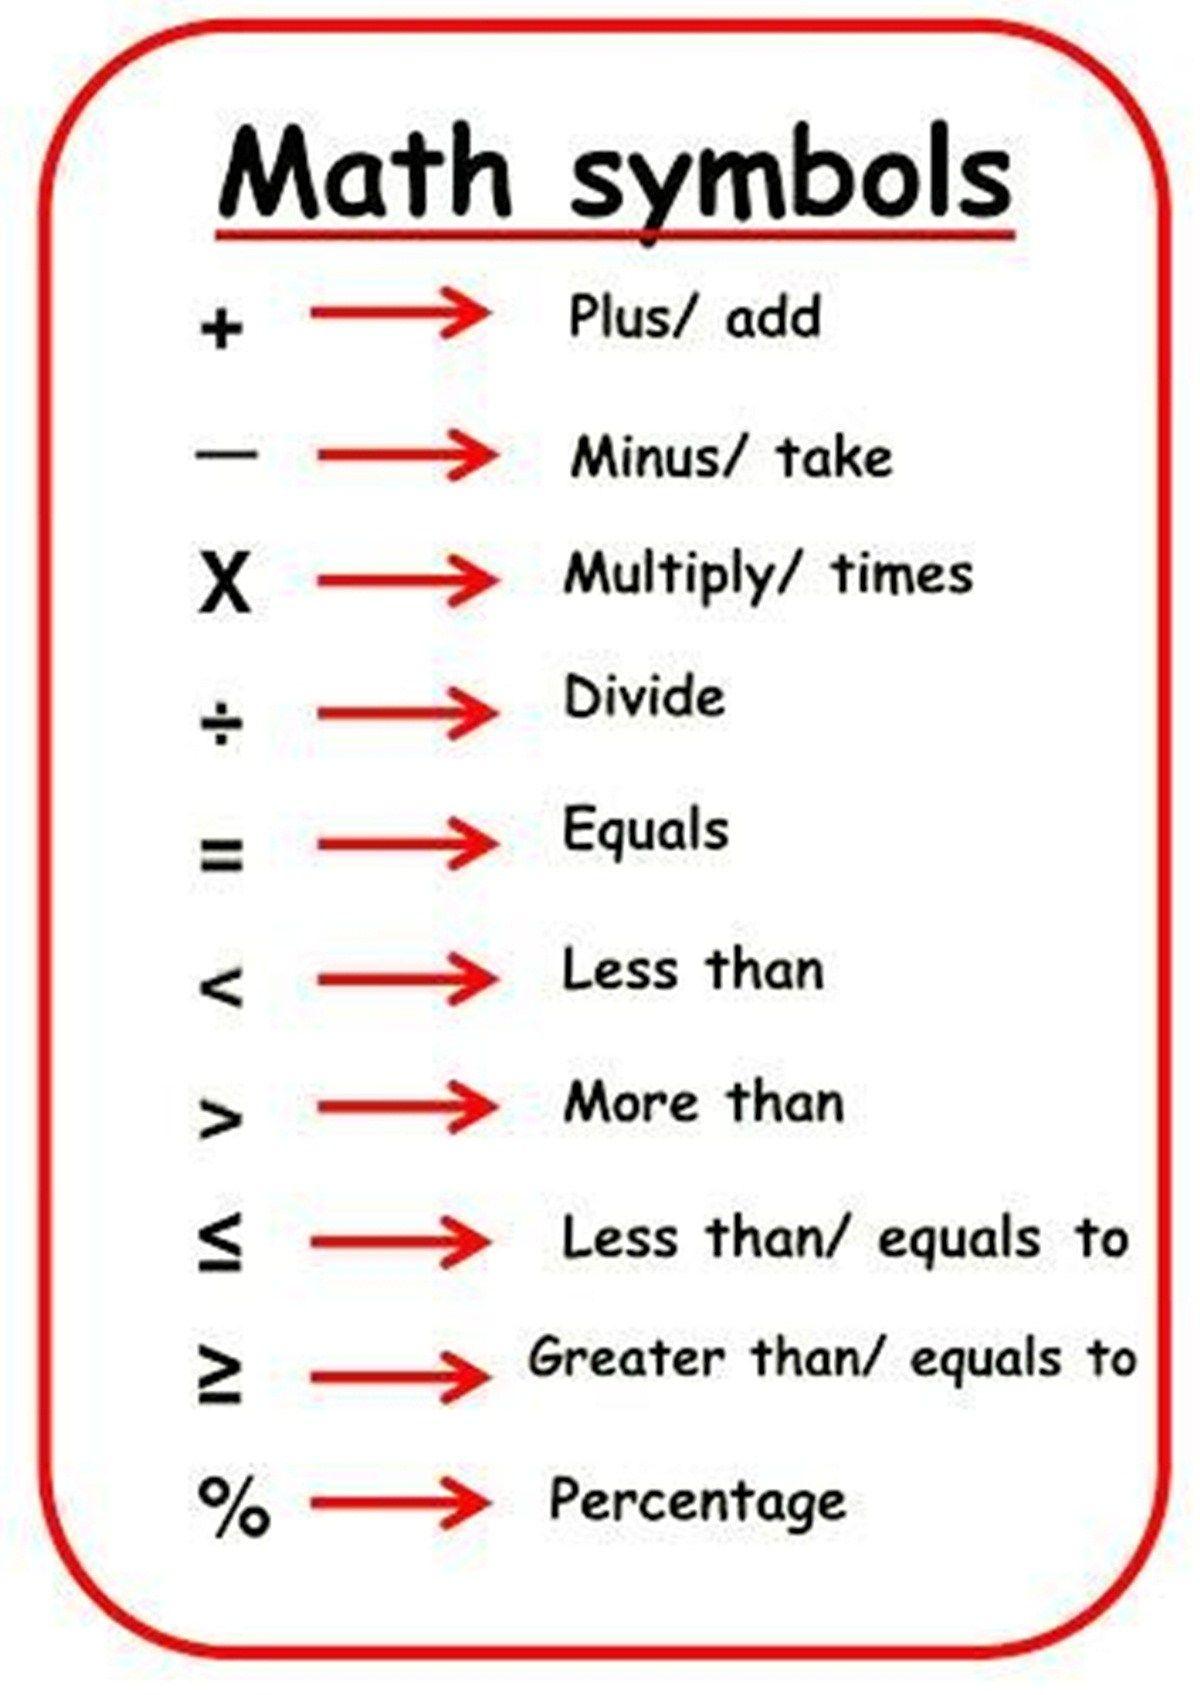 Worksheet On Math Symbols